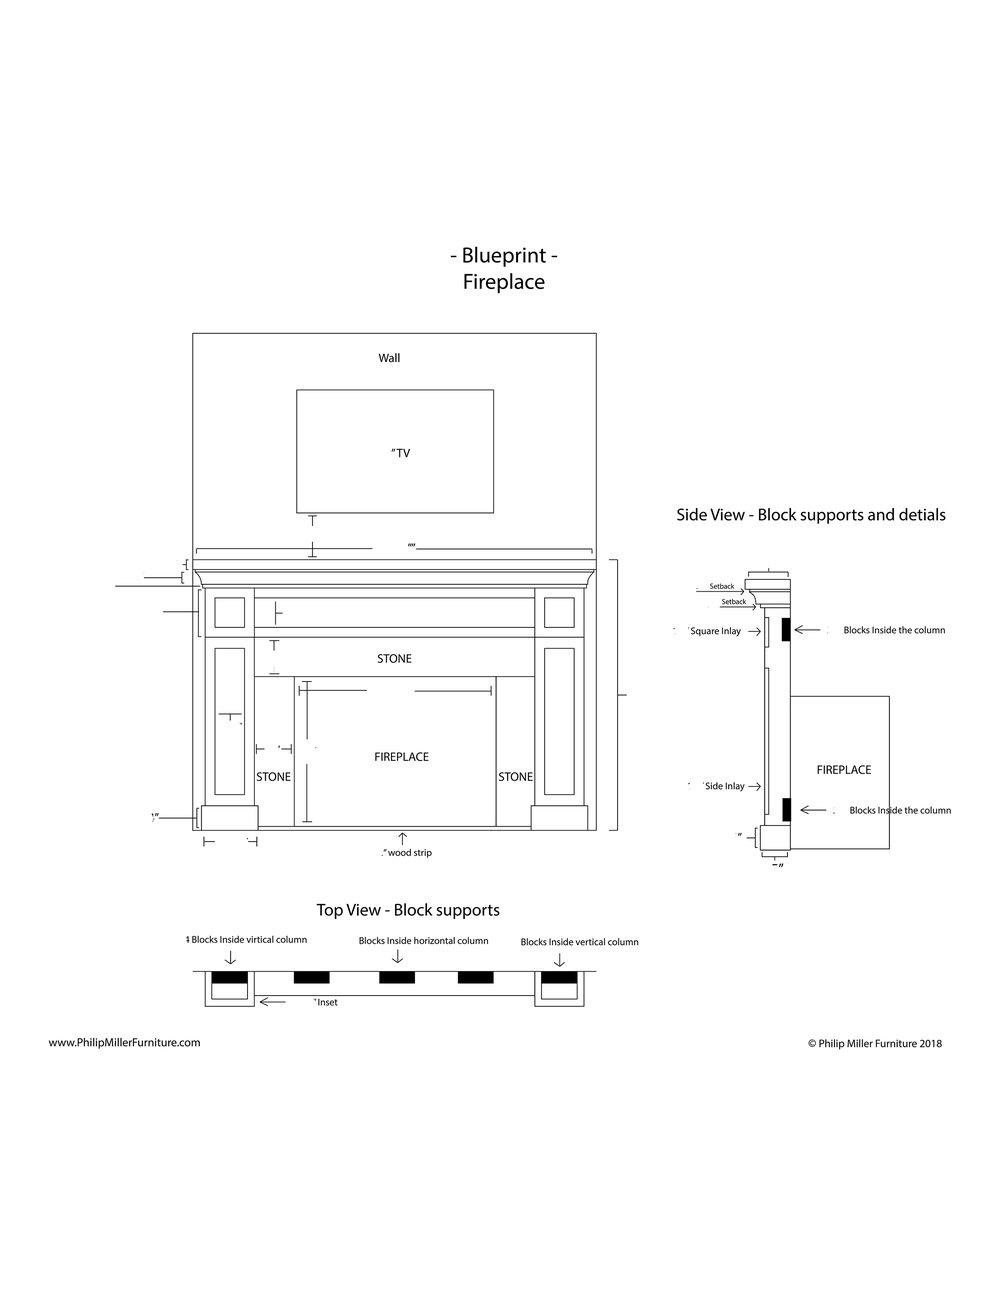 Build Instructions   - Shaker Fireplace Mantel, Cabinets & Shelves    - $20